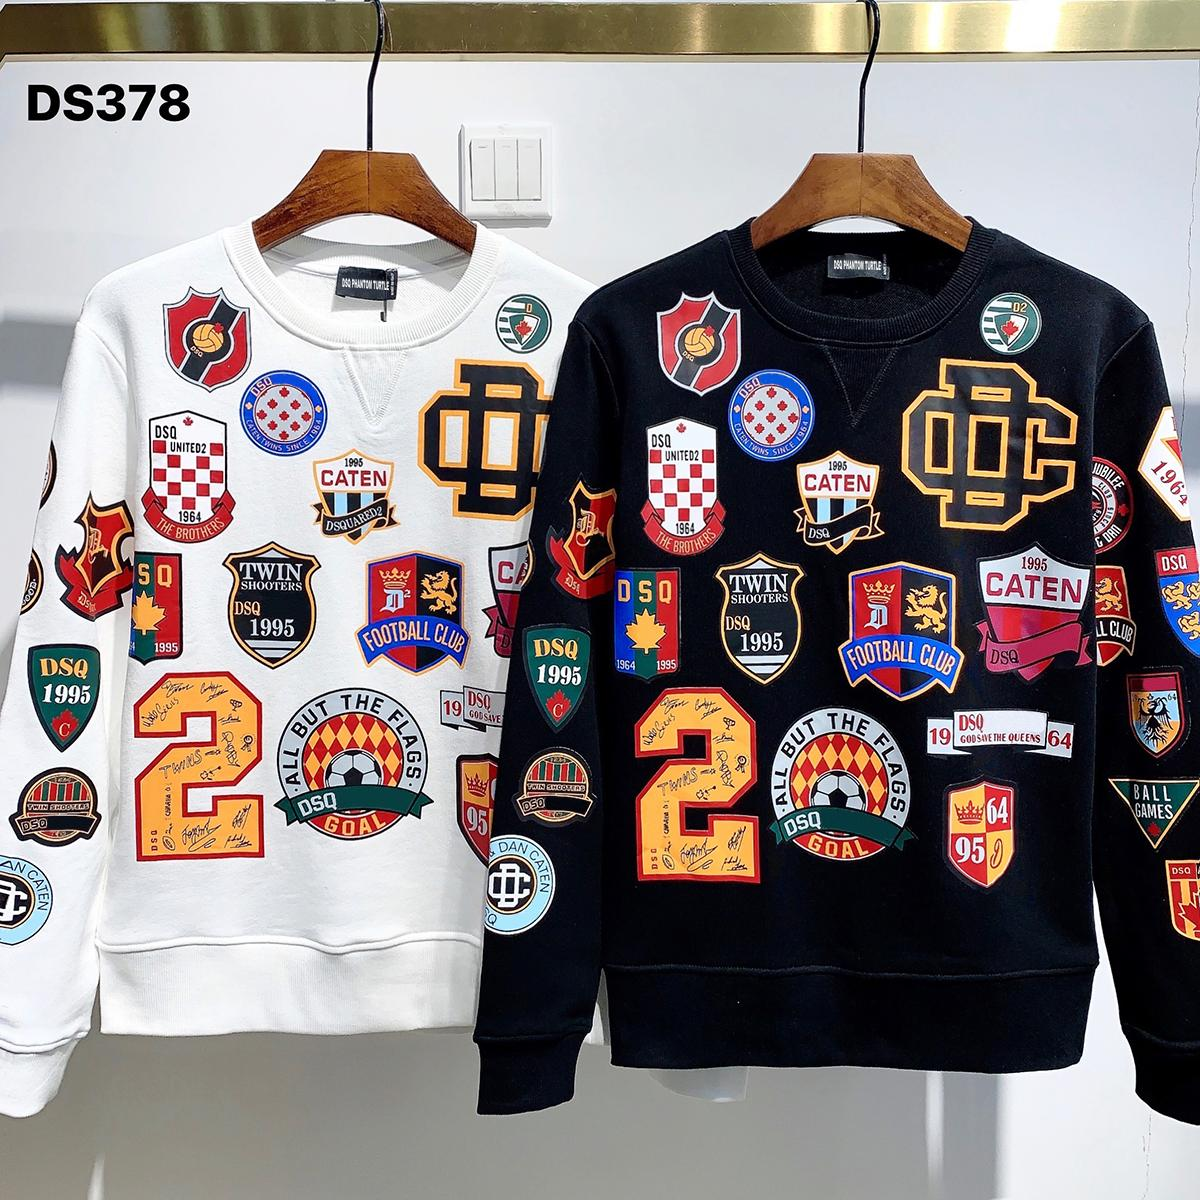 DSQ Phantom Turtle Hoody New Herren Designer Hoodies Italien Mode Sweatshirts Herbst Druck DSQ Hoodie Männliche Top Qualität 100% Baumwolle Tops 03219